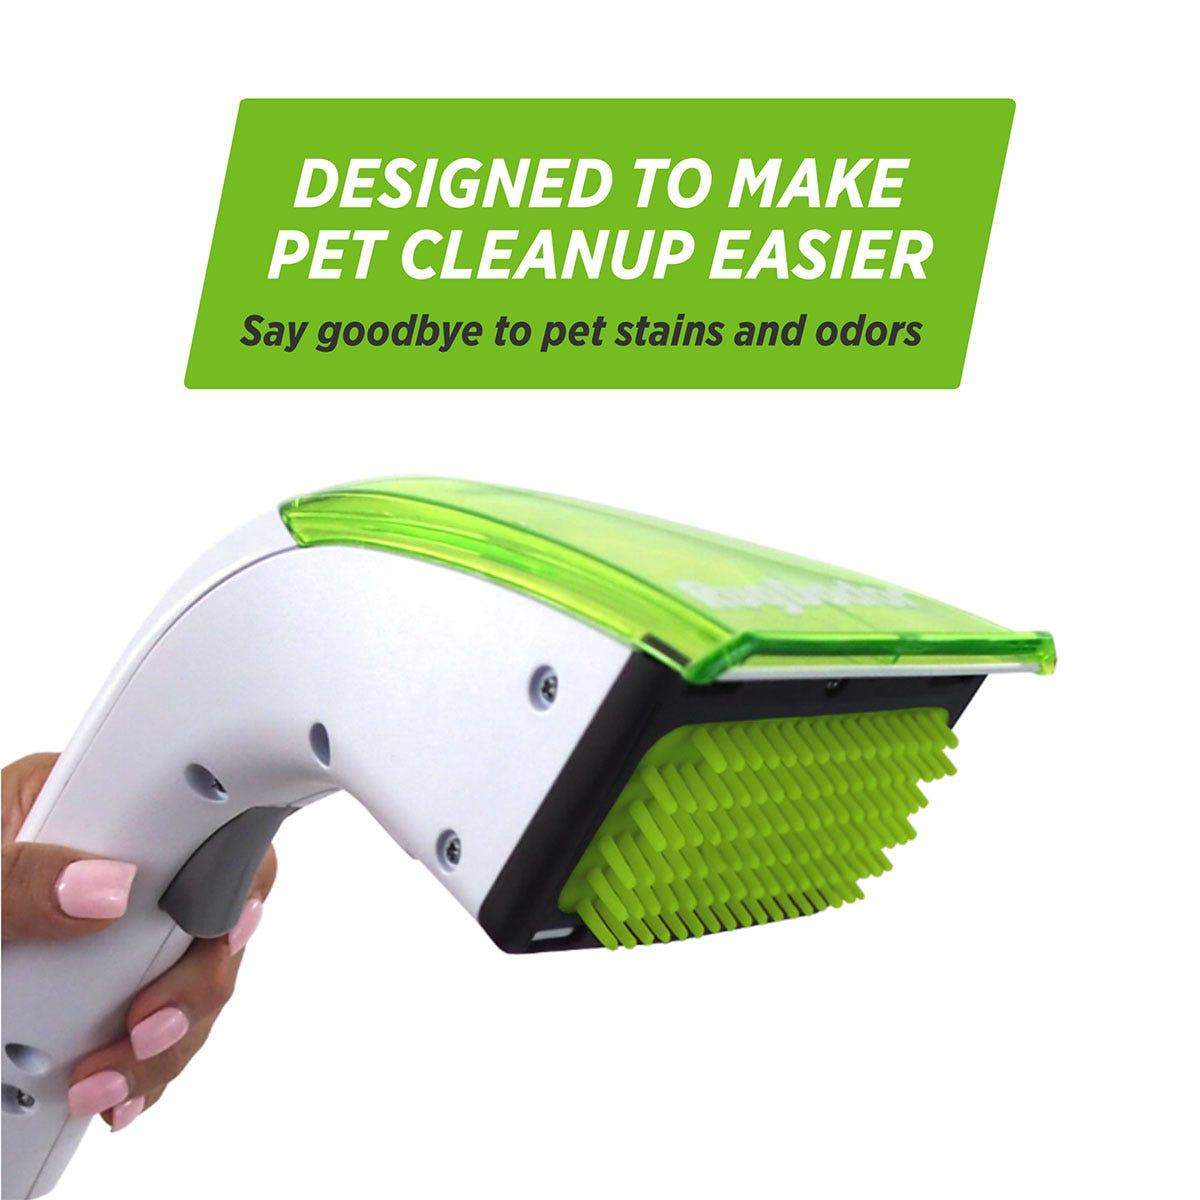 Designed to make pet clean up easier